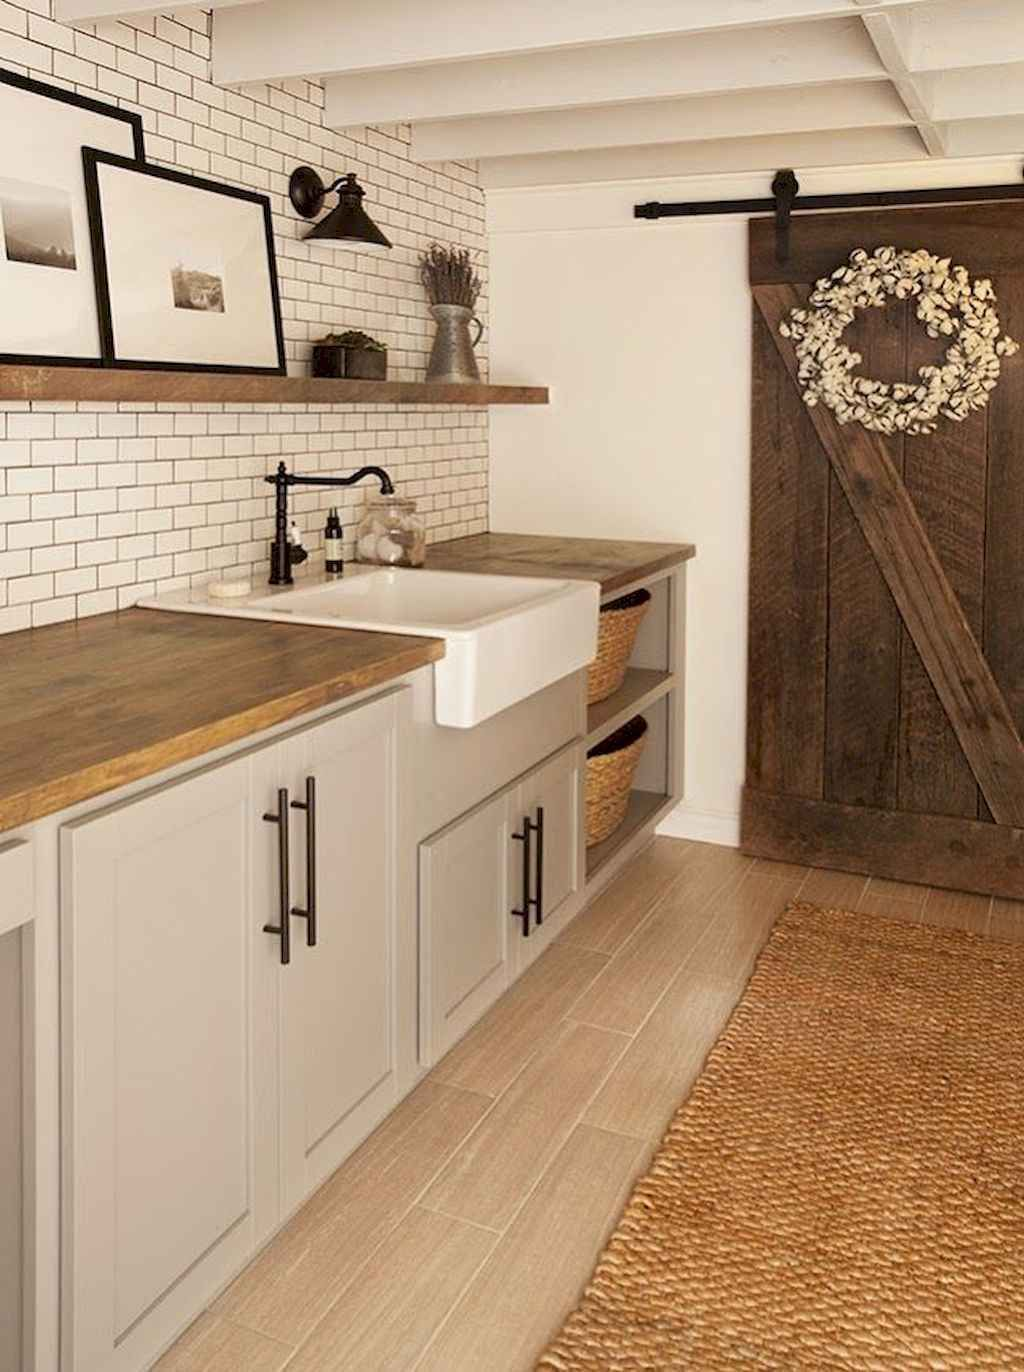 40+ Rustic Farmhouse Laundry Room Design Ideas and Makeover - carolanne news